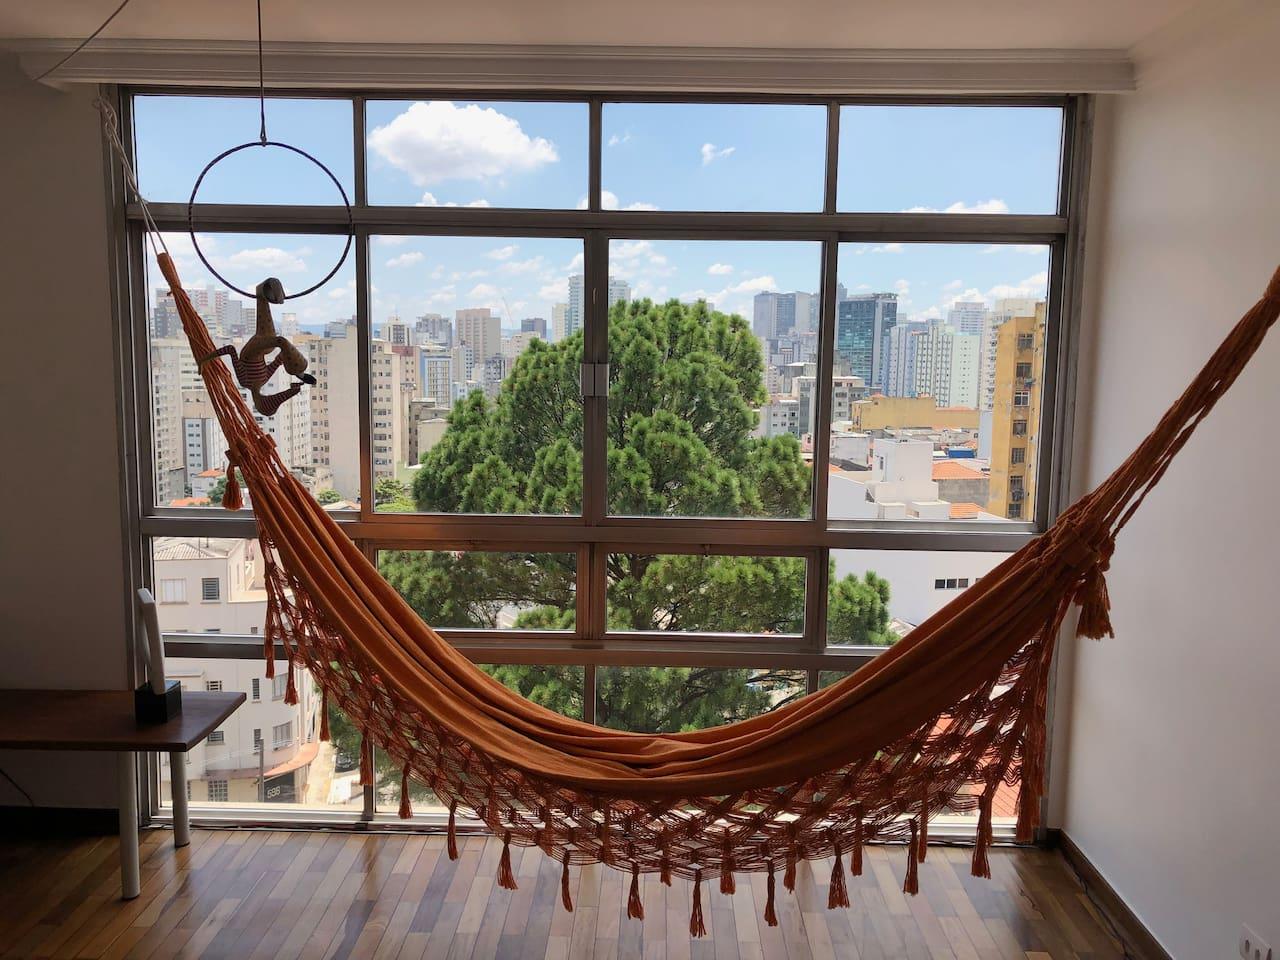 Living room view to the São Paulo city center neighbourhood and landmark buildings